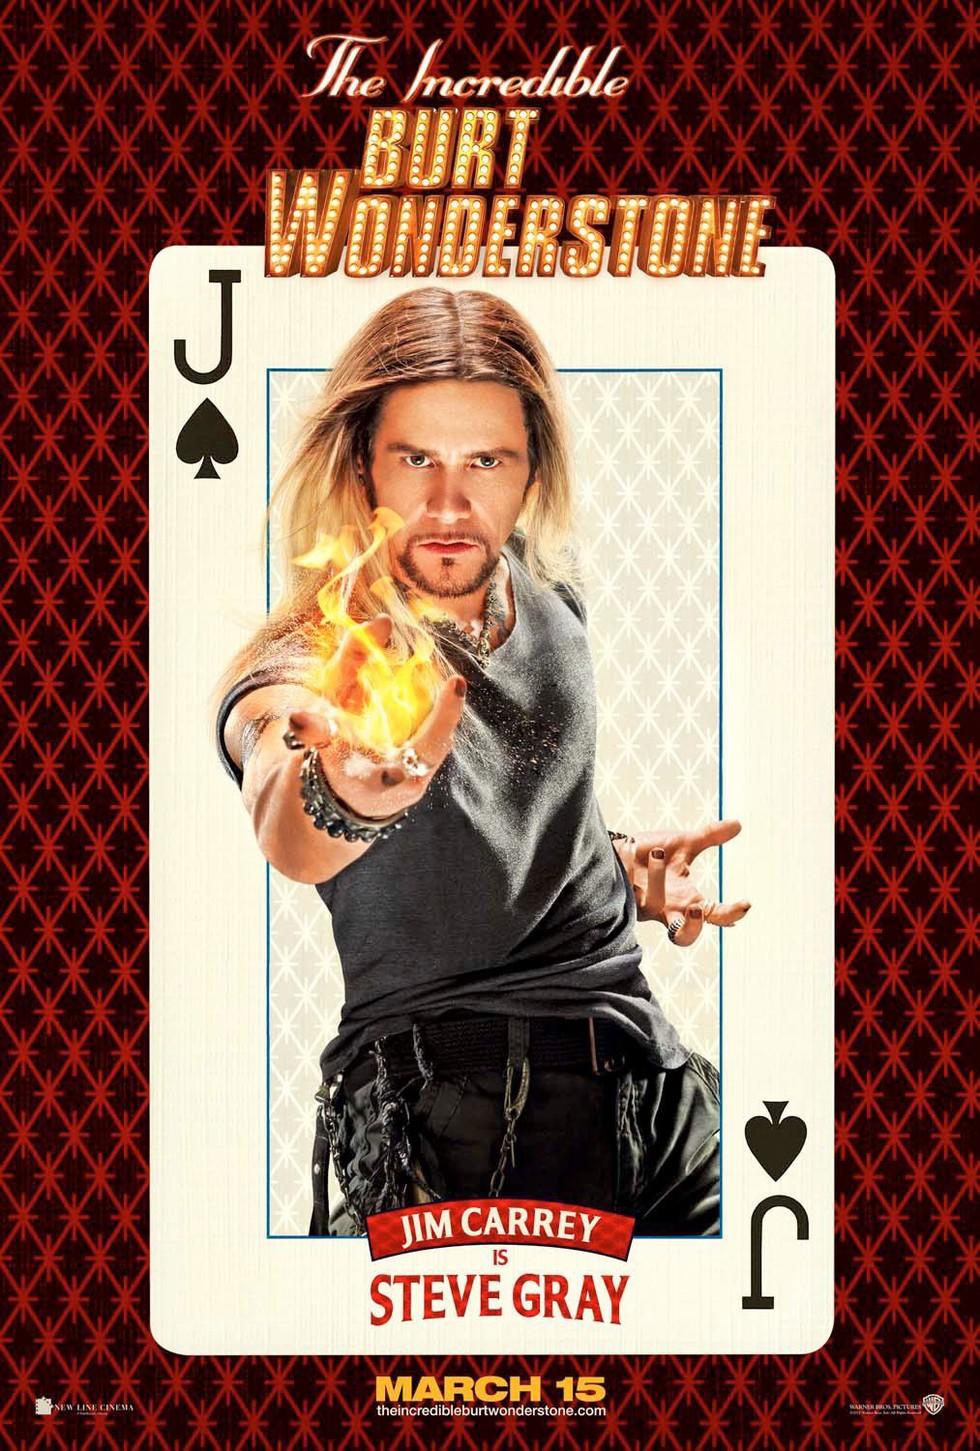 The Incredible Burt Wonderstone - Movie Poster #7 (Large)